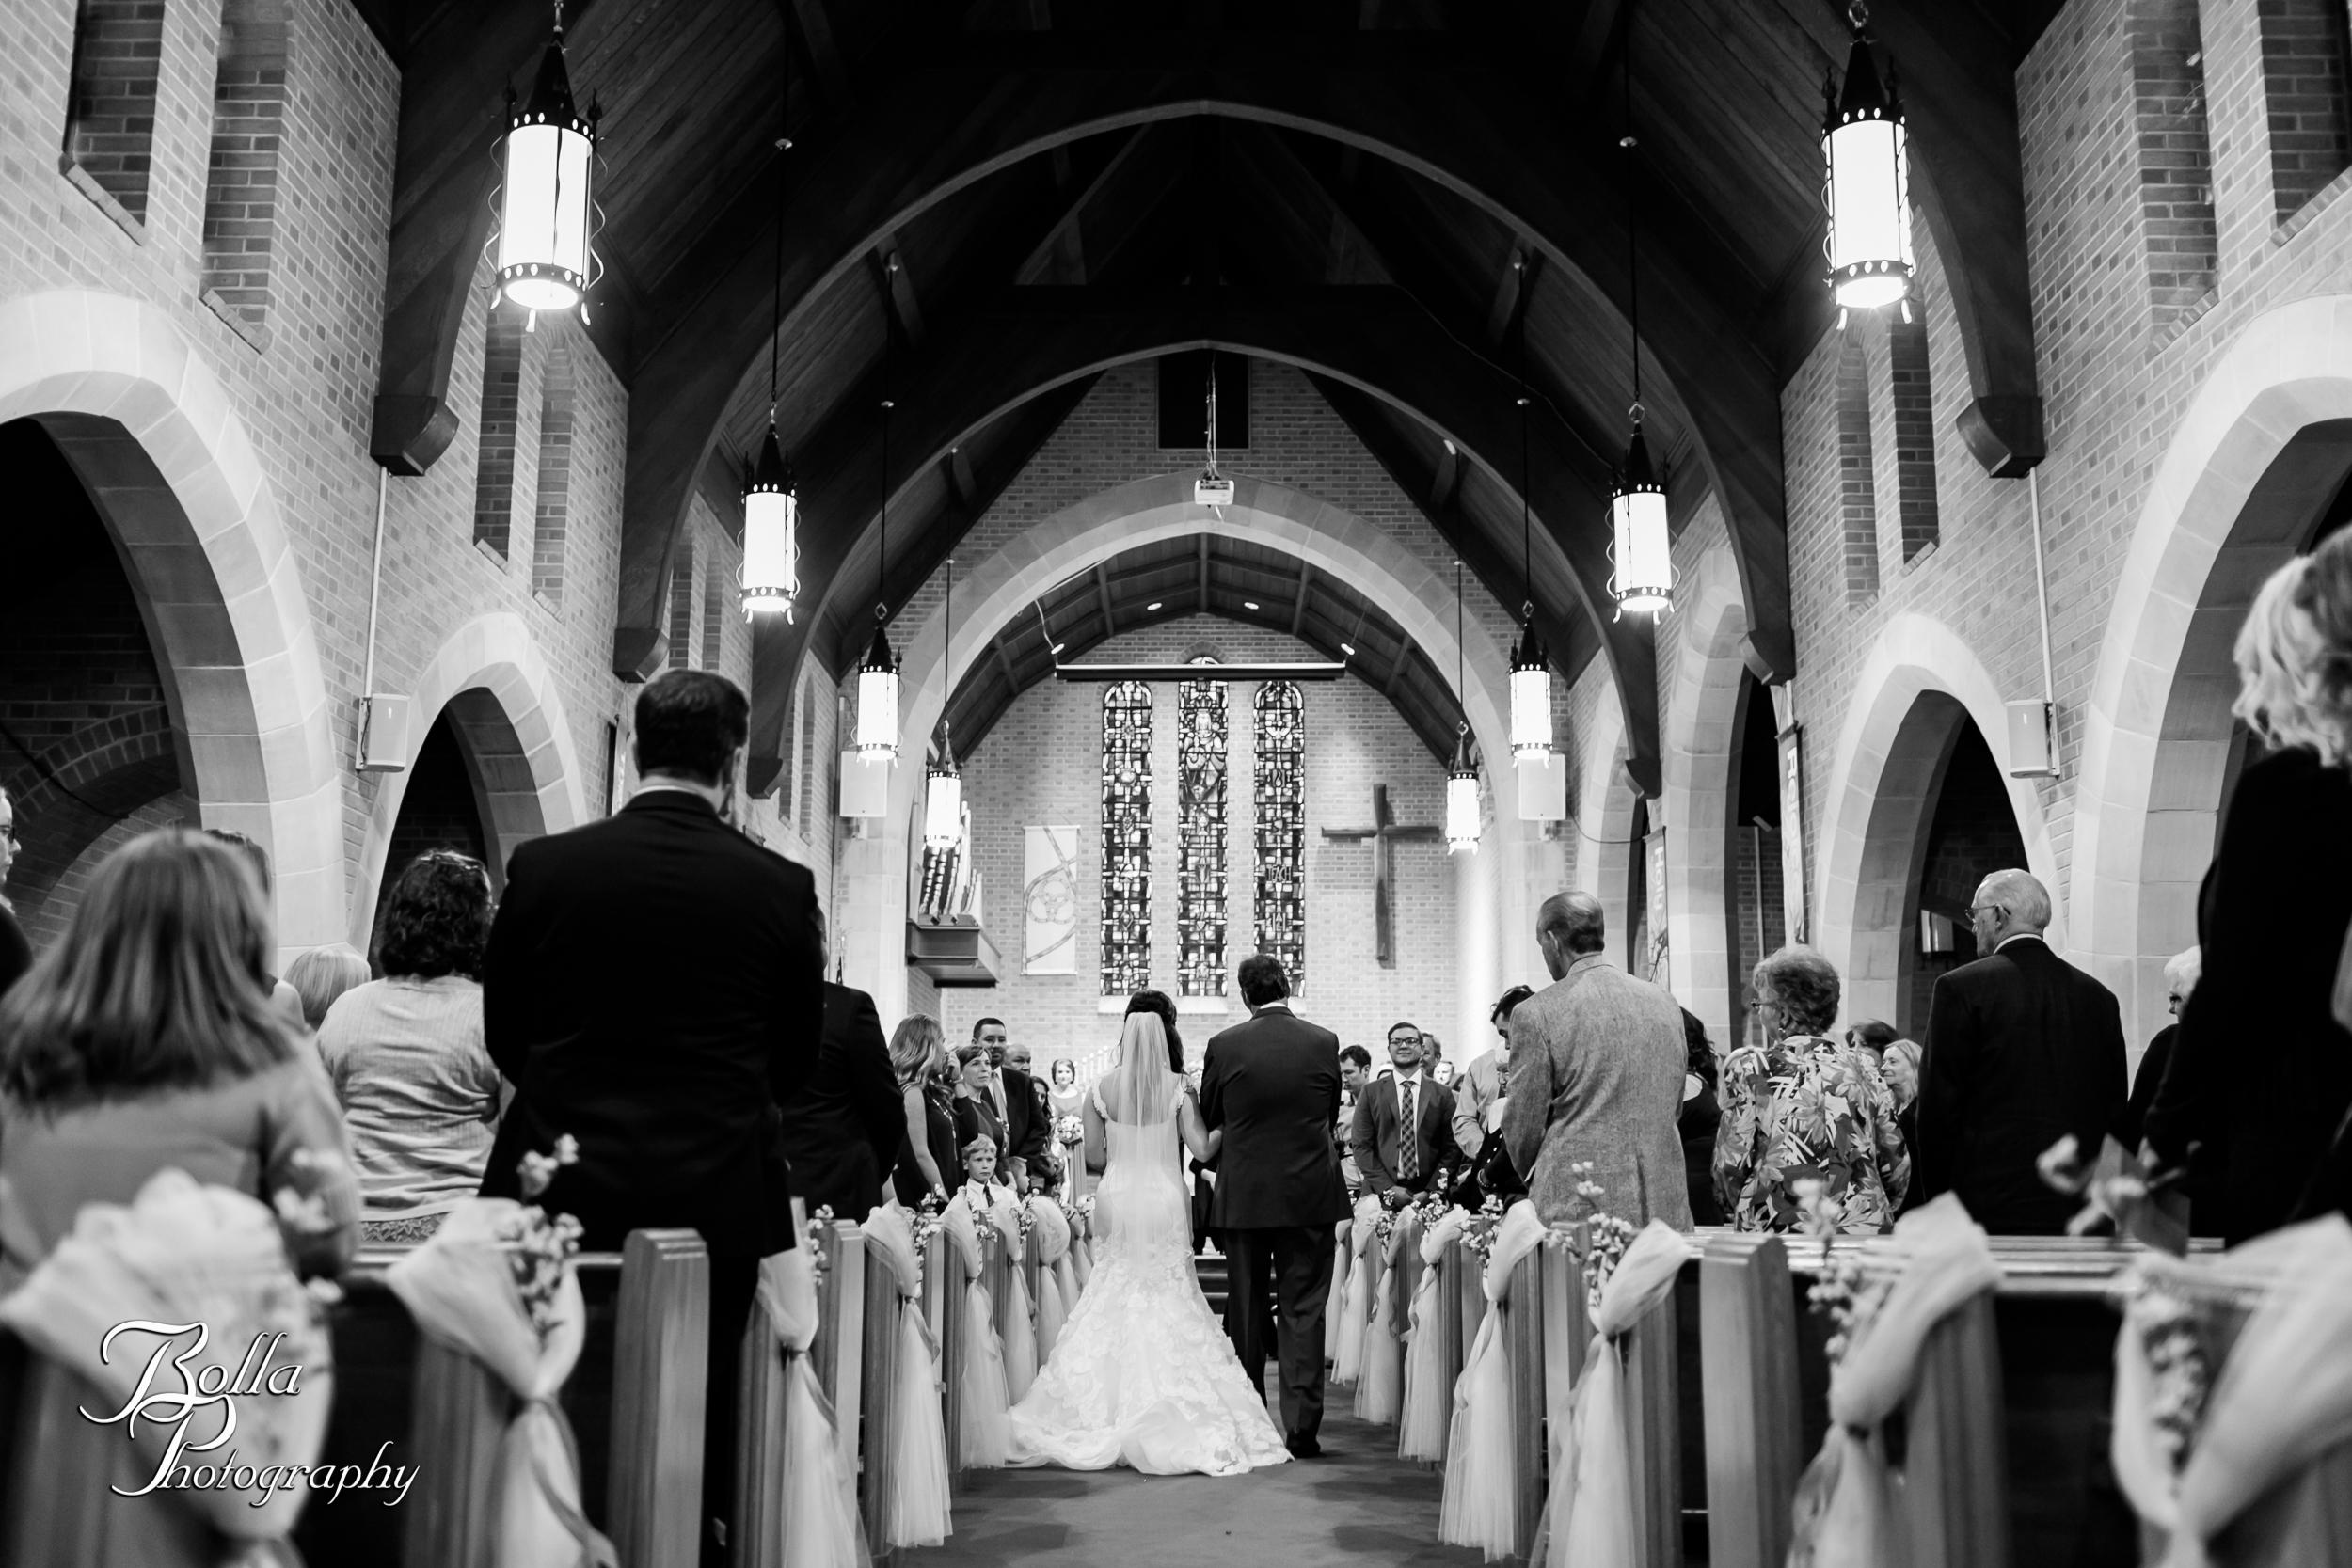 Bolla_photography_edwardsville_wedding_photographer_st_louis_weddings_Reilmann-0132.jpg